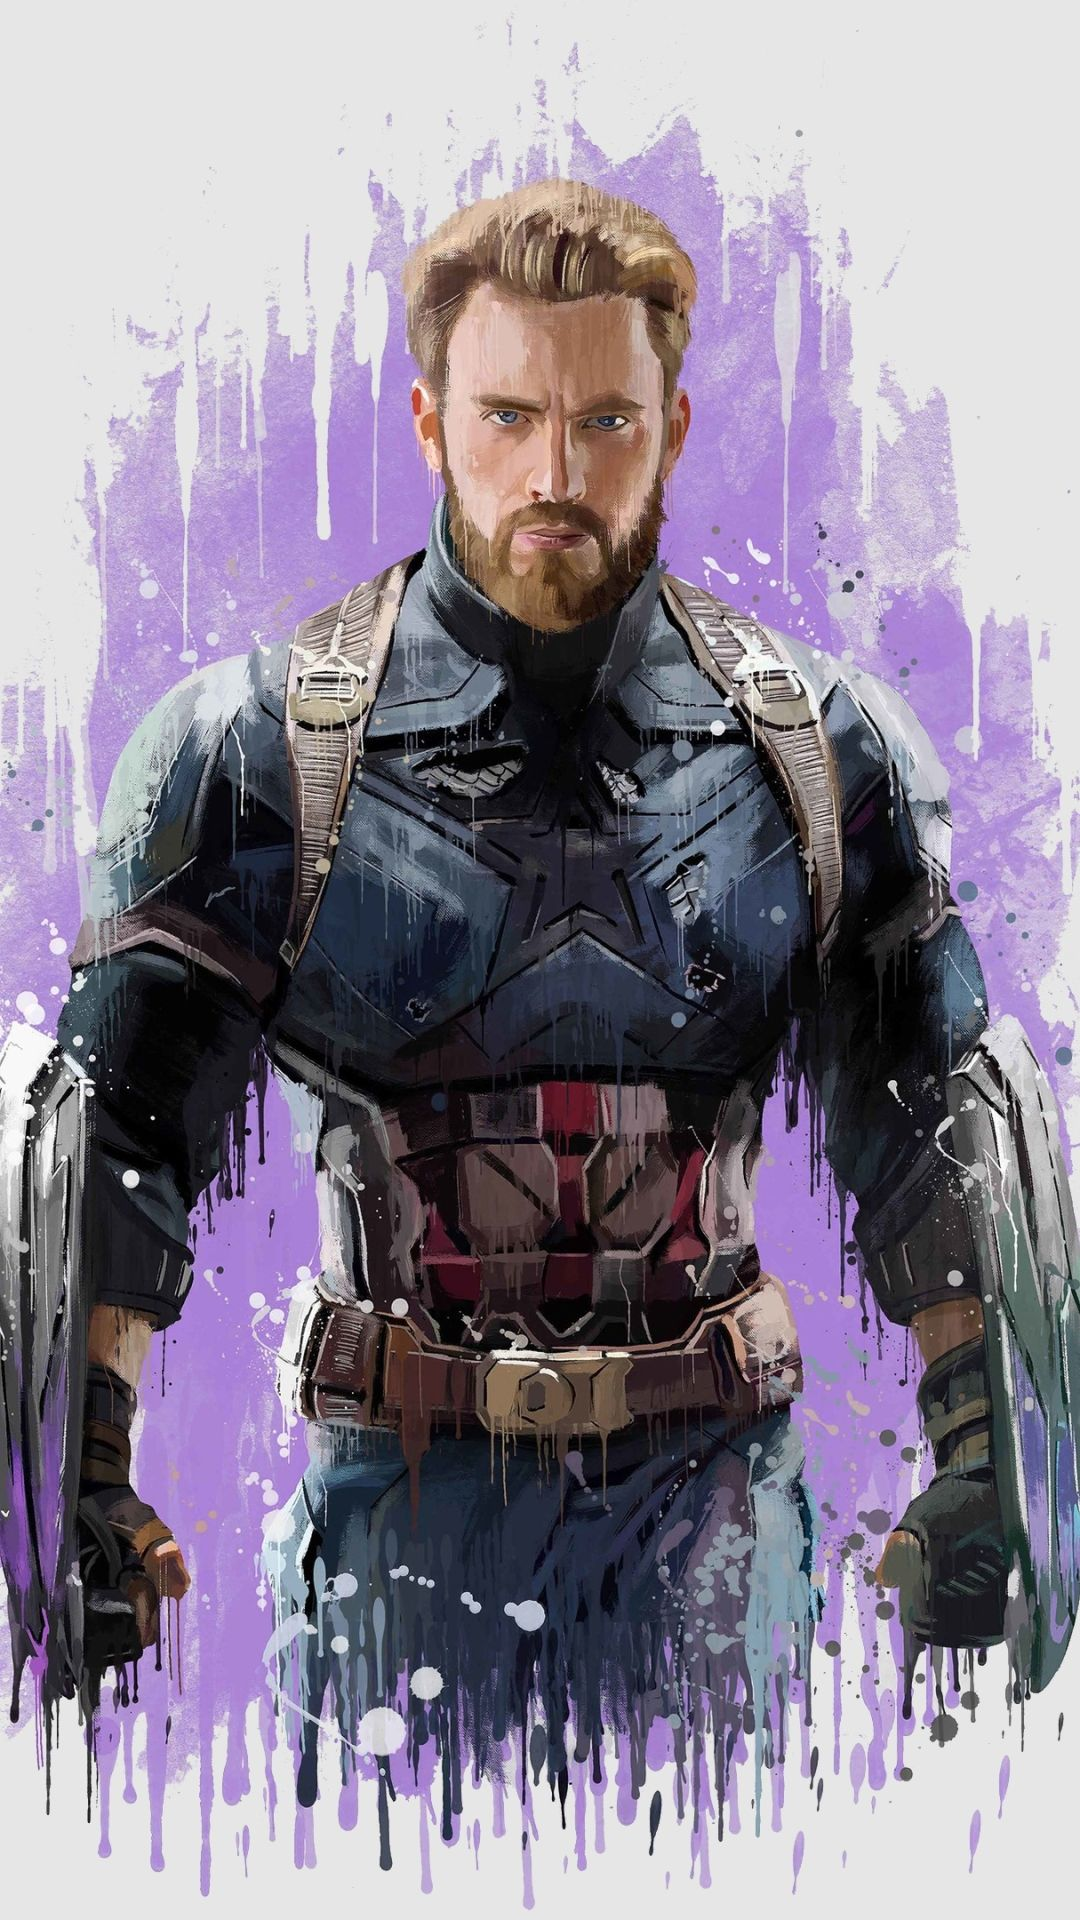 Movie Avengers Infinity War 1080x1920 Wallpaper Id 73242 Captain America Wallpaper Captain America Avengers